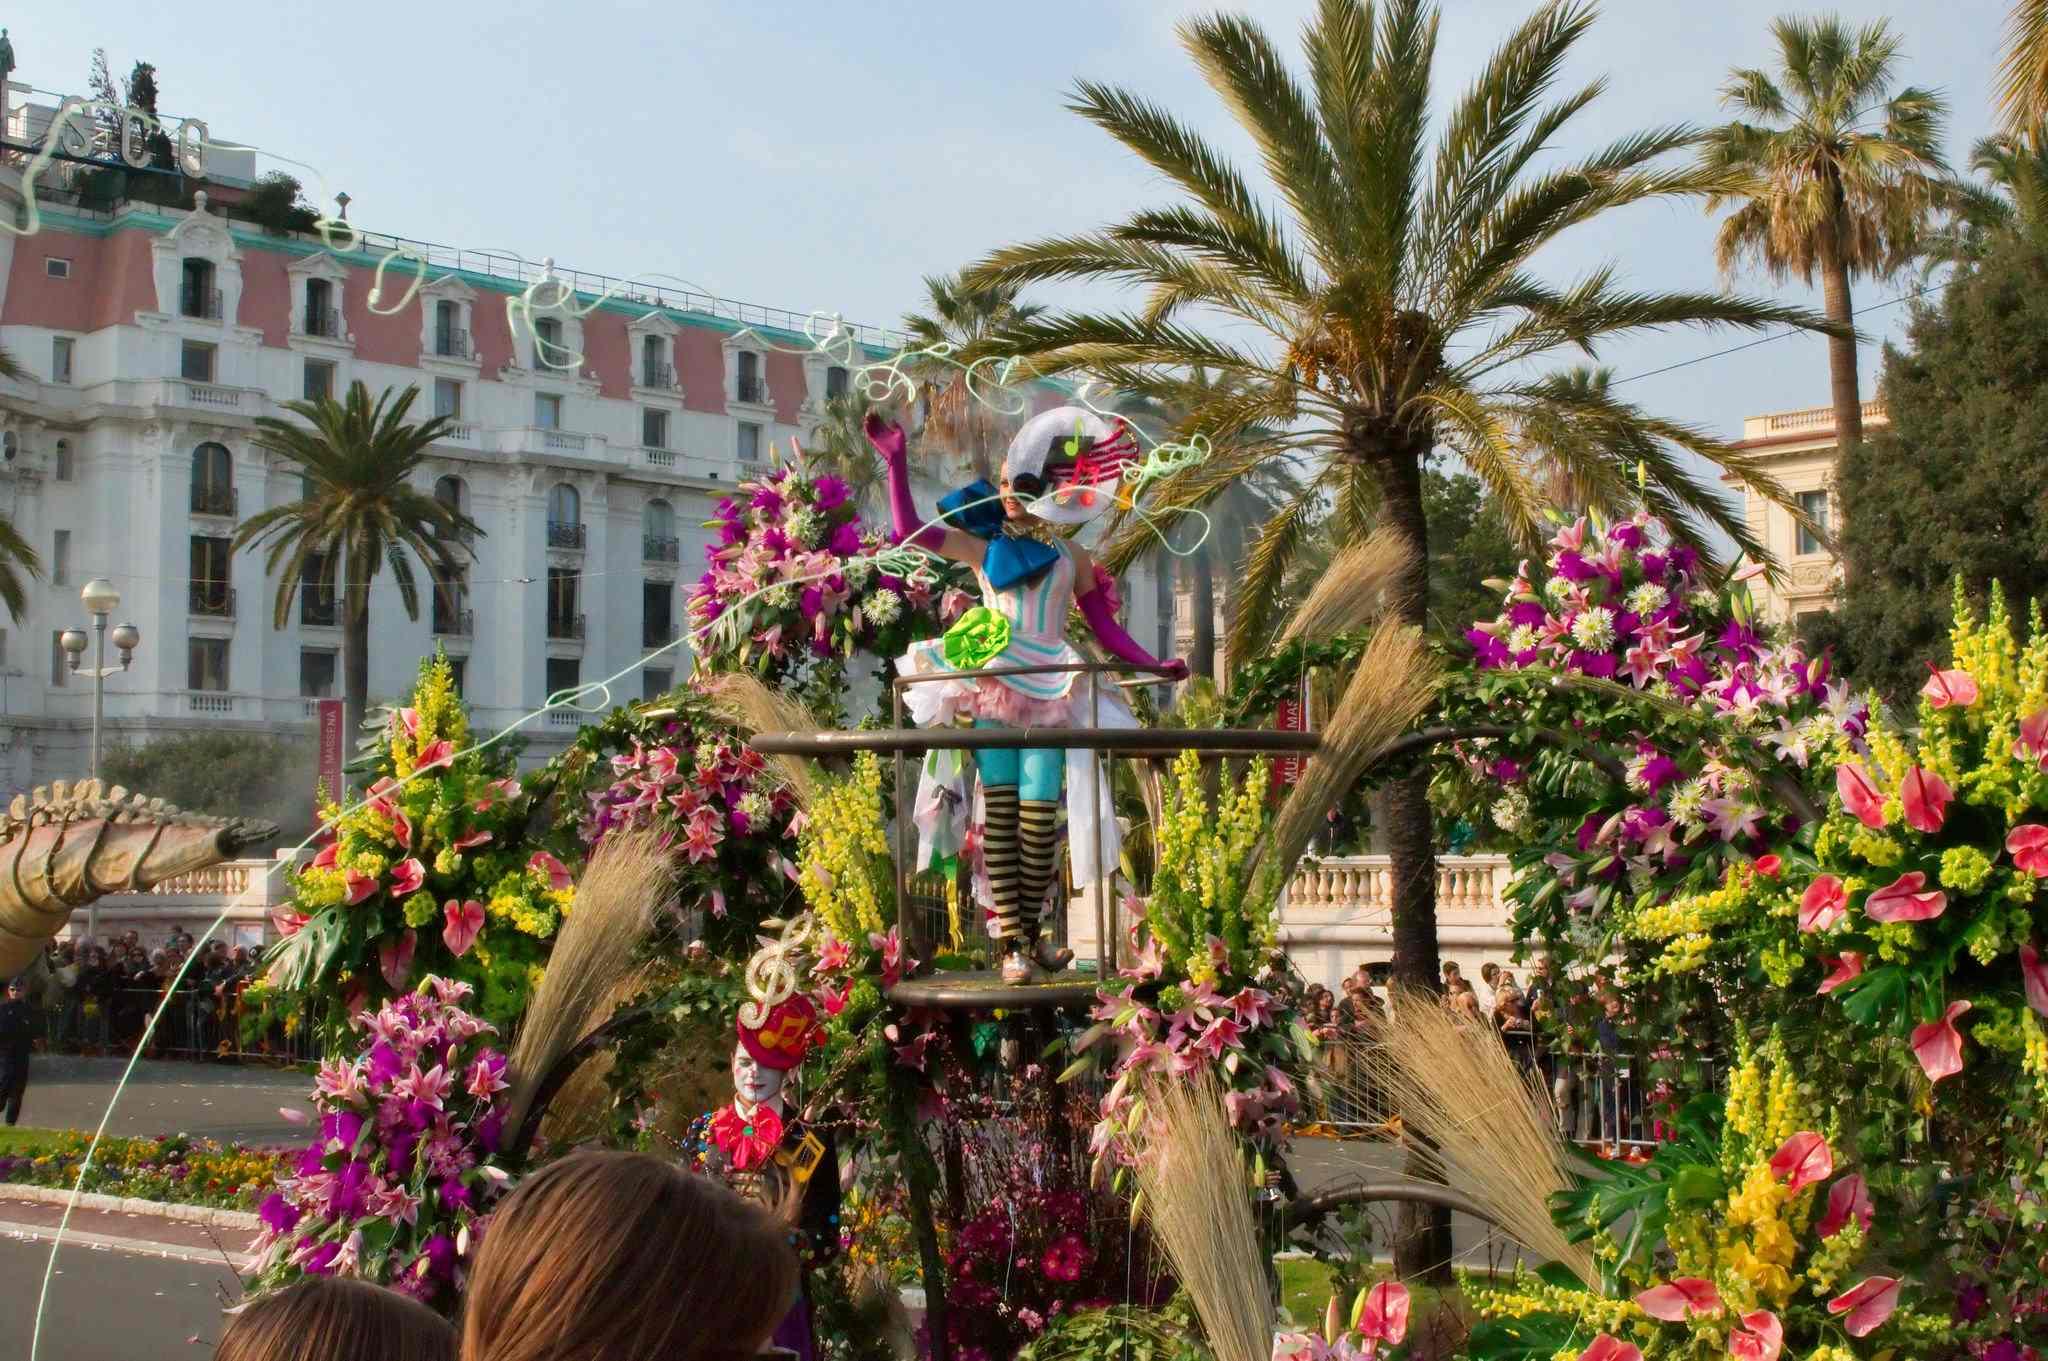 Bataille de fleur, carnaval de Nice en 2009